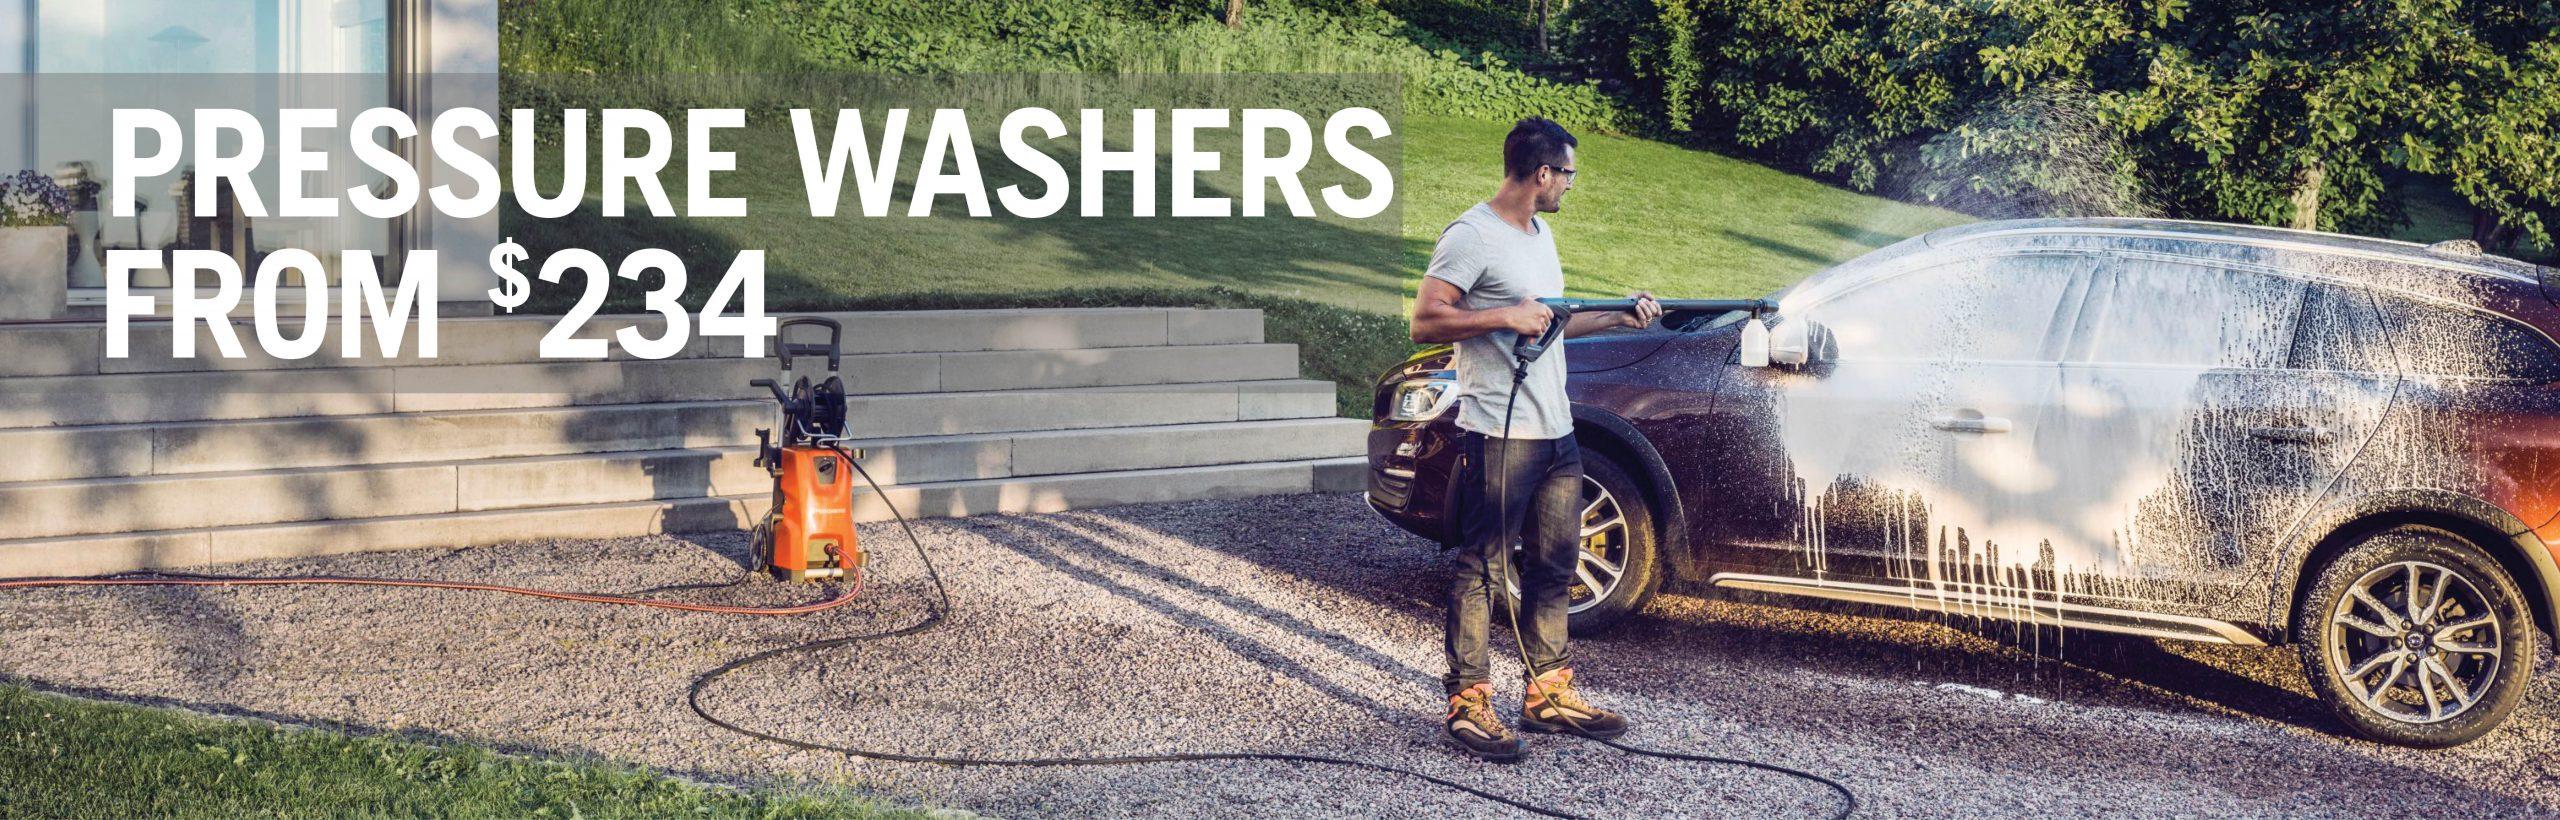 Spring 2020 - Pressure Washers